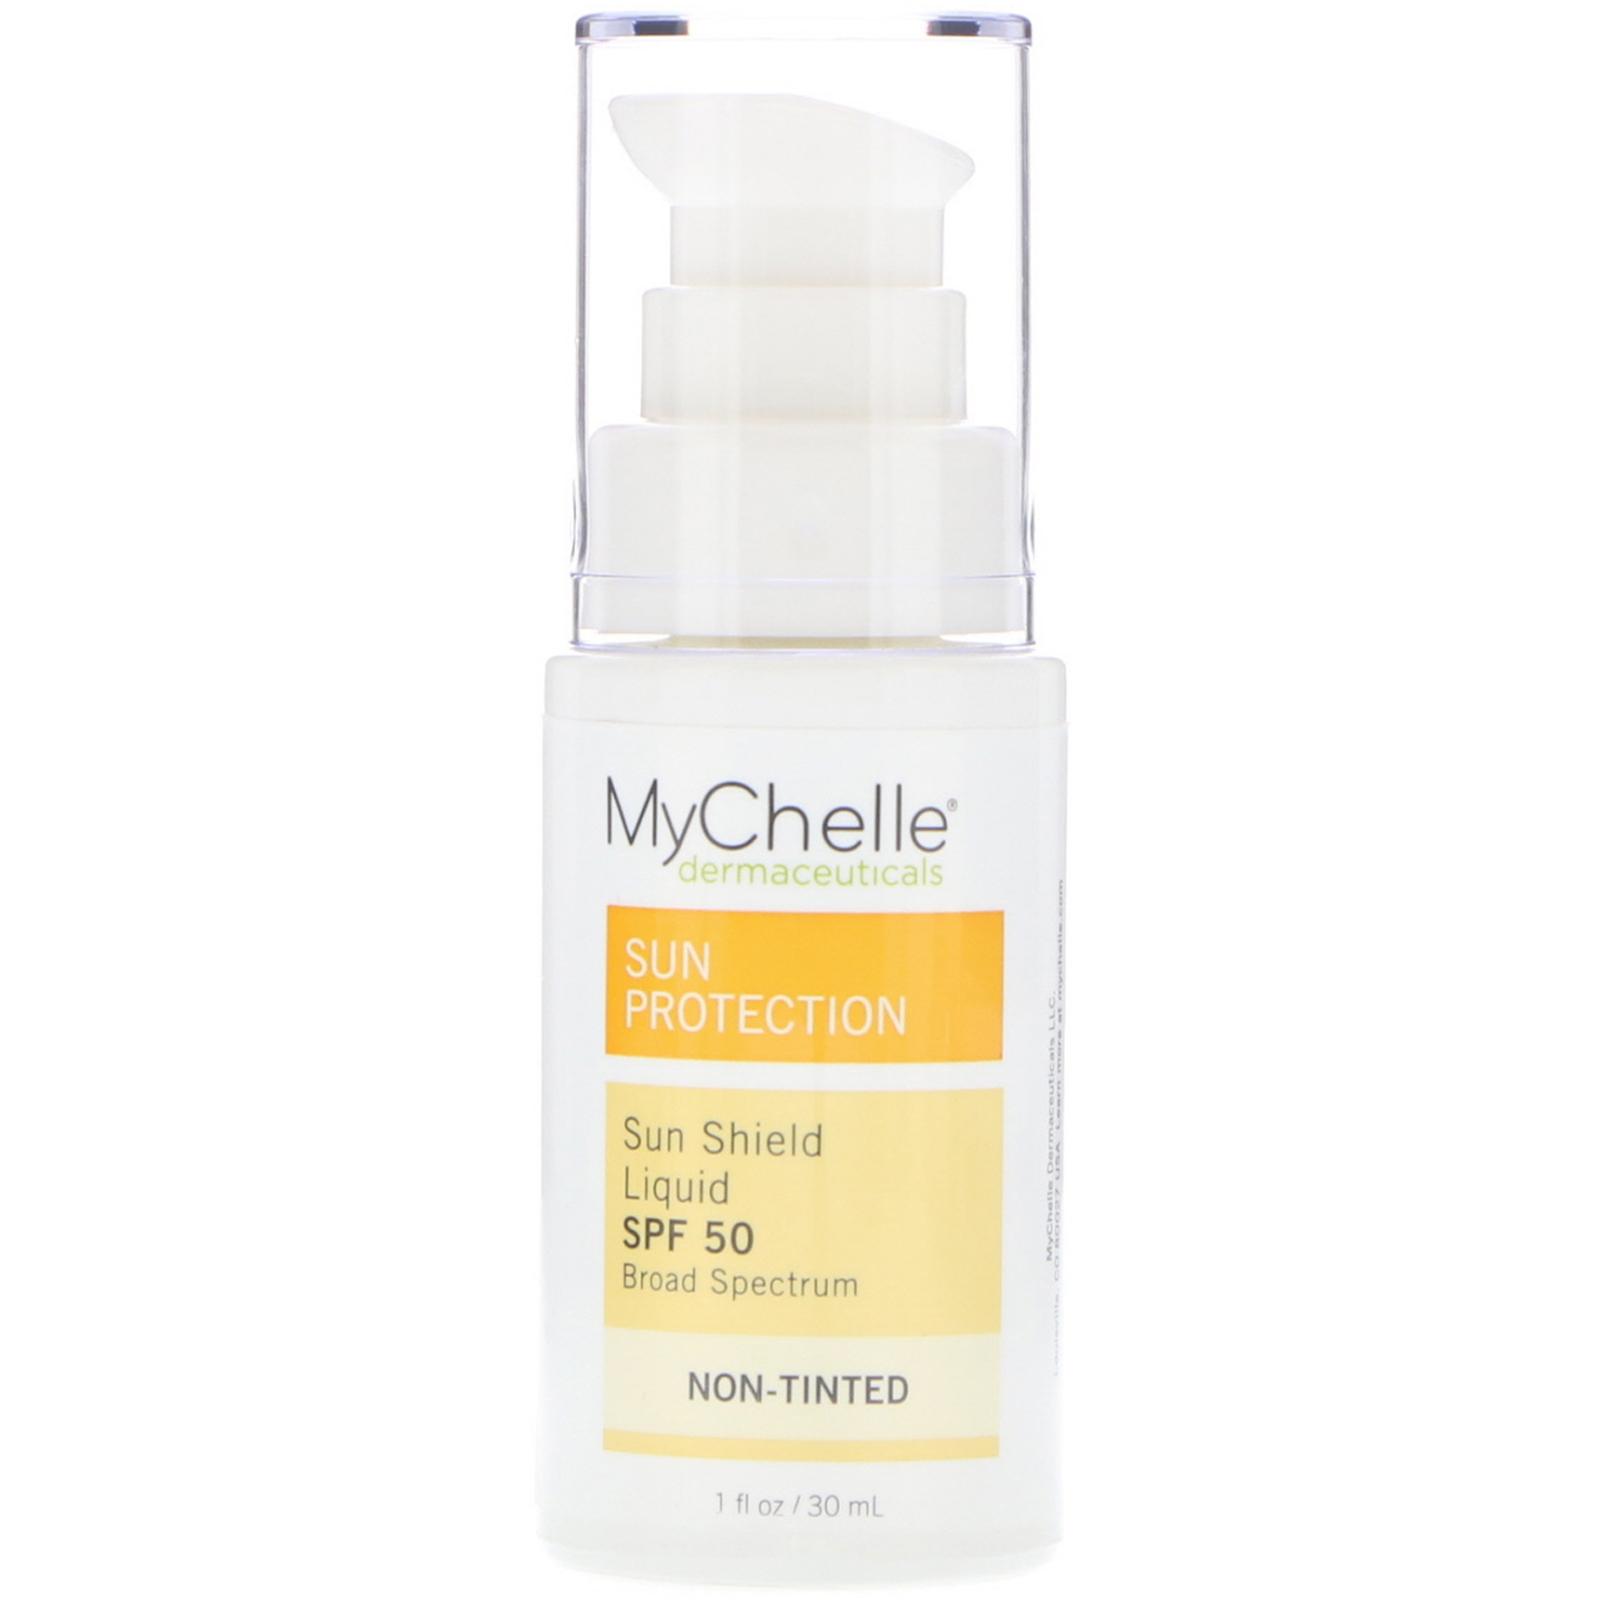 MyChelle Dermaceuticals Sun Shield Liquid Spf 50 Non-Tinted